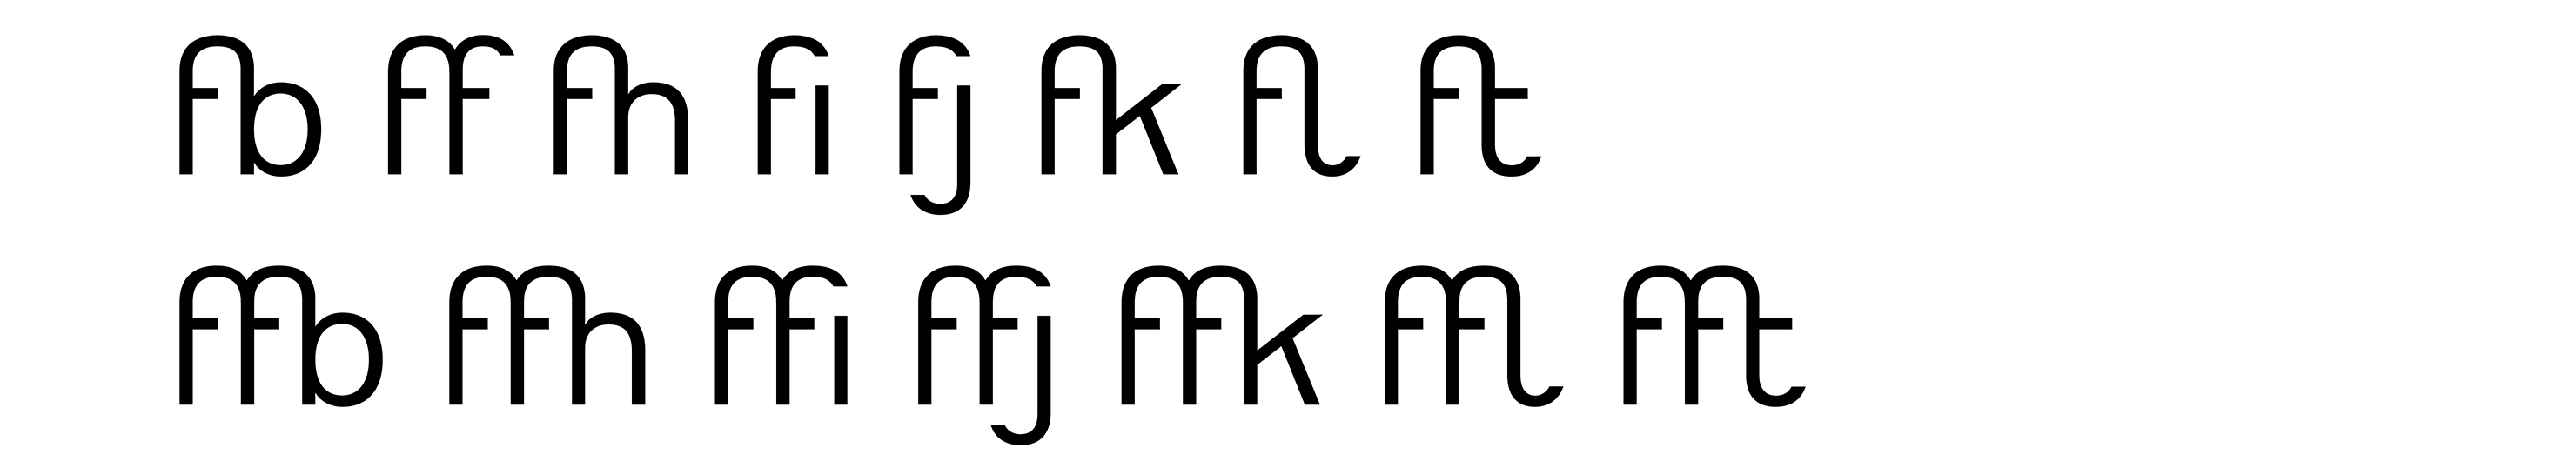 Typeface-Heimat-Sans-F03-Atlas-Font-Foundry